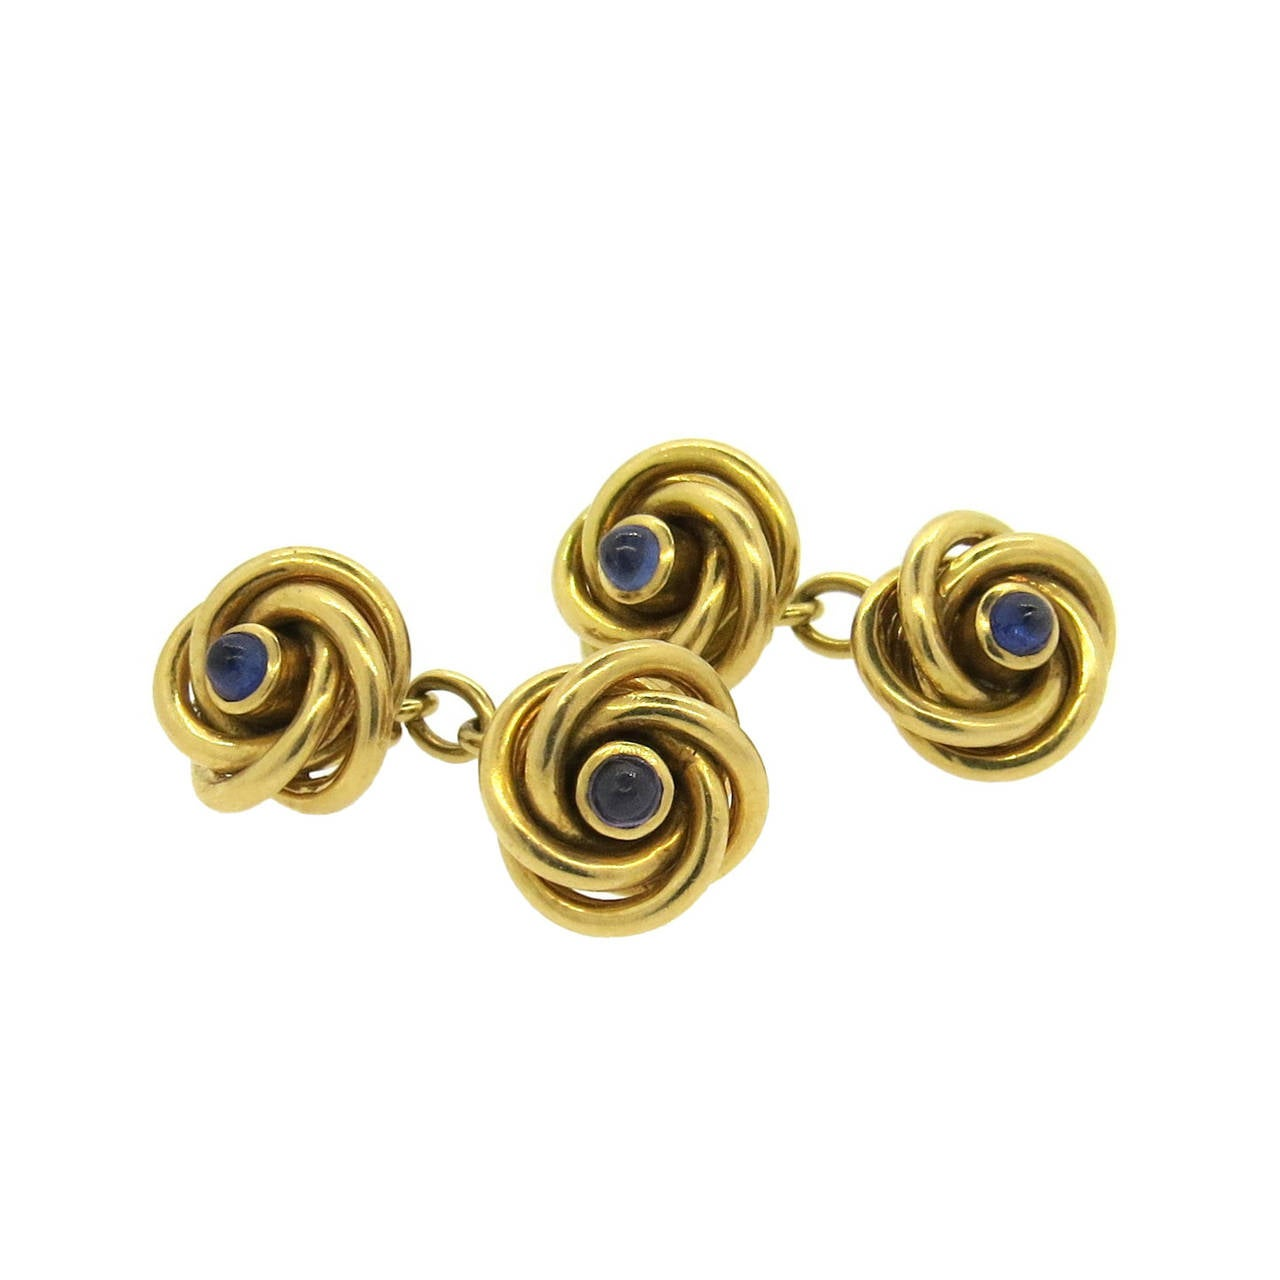 Retro Sapphire Gold Knot Cufflinks